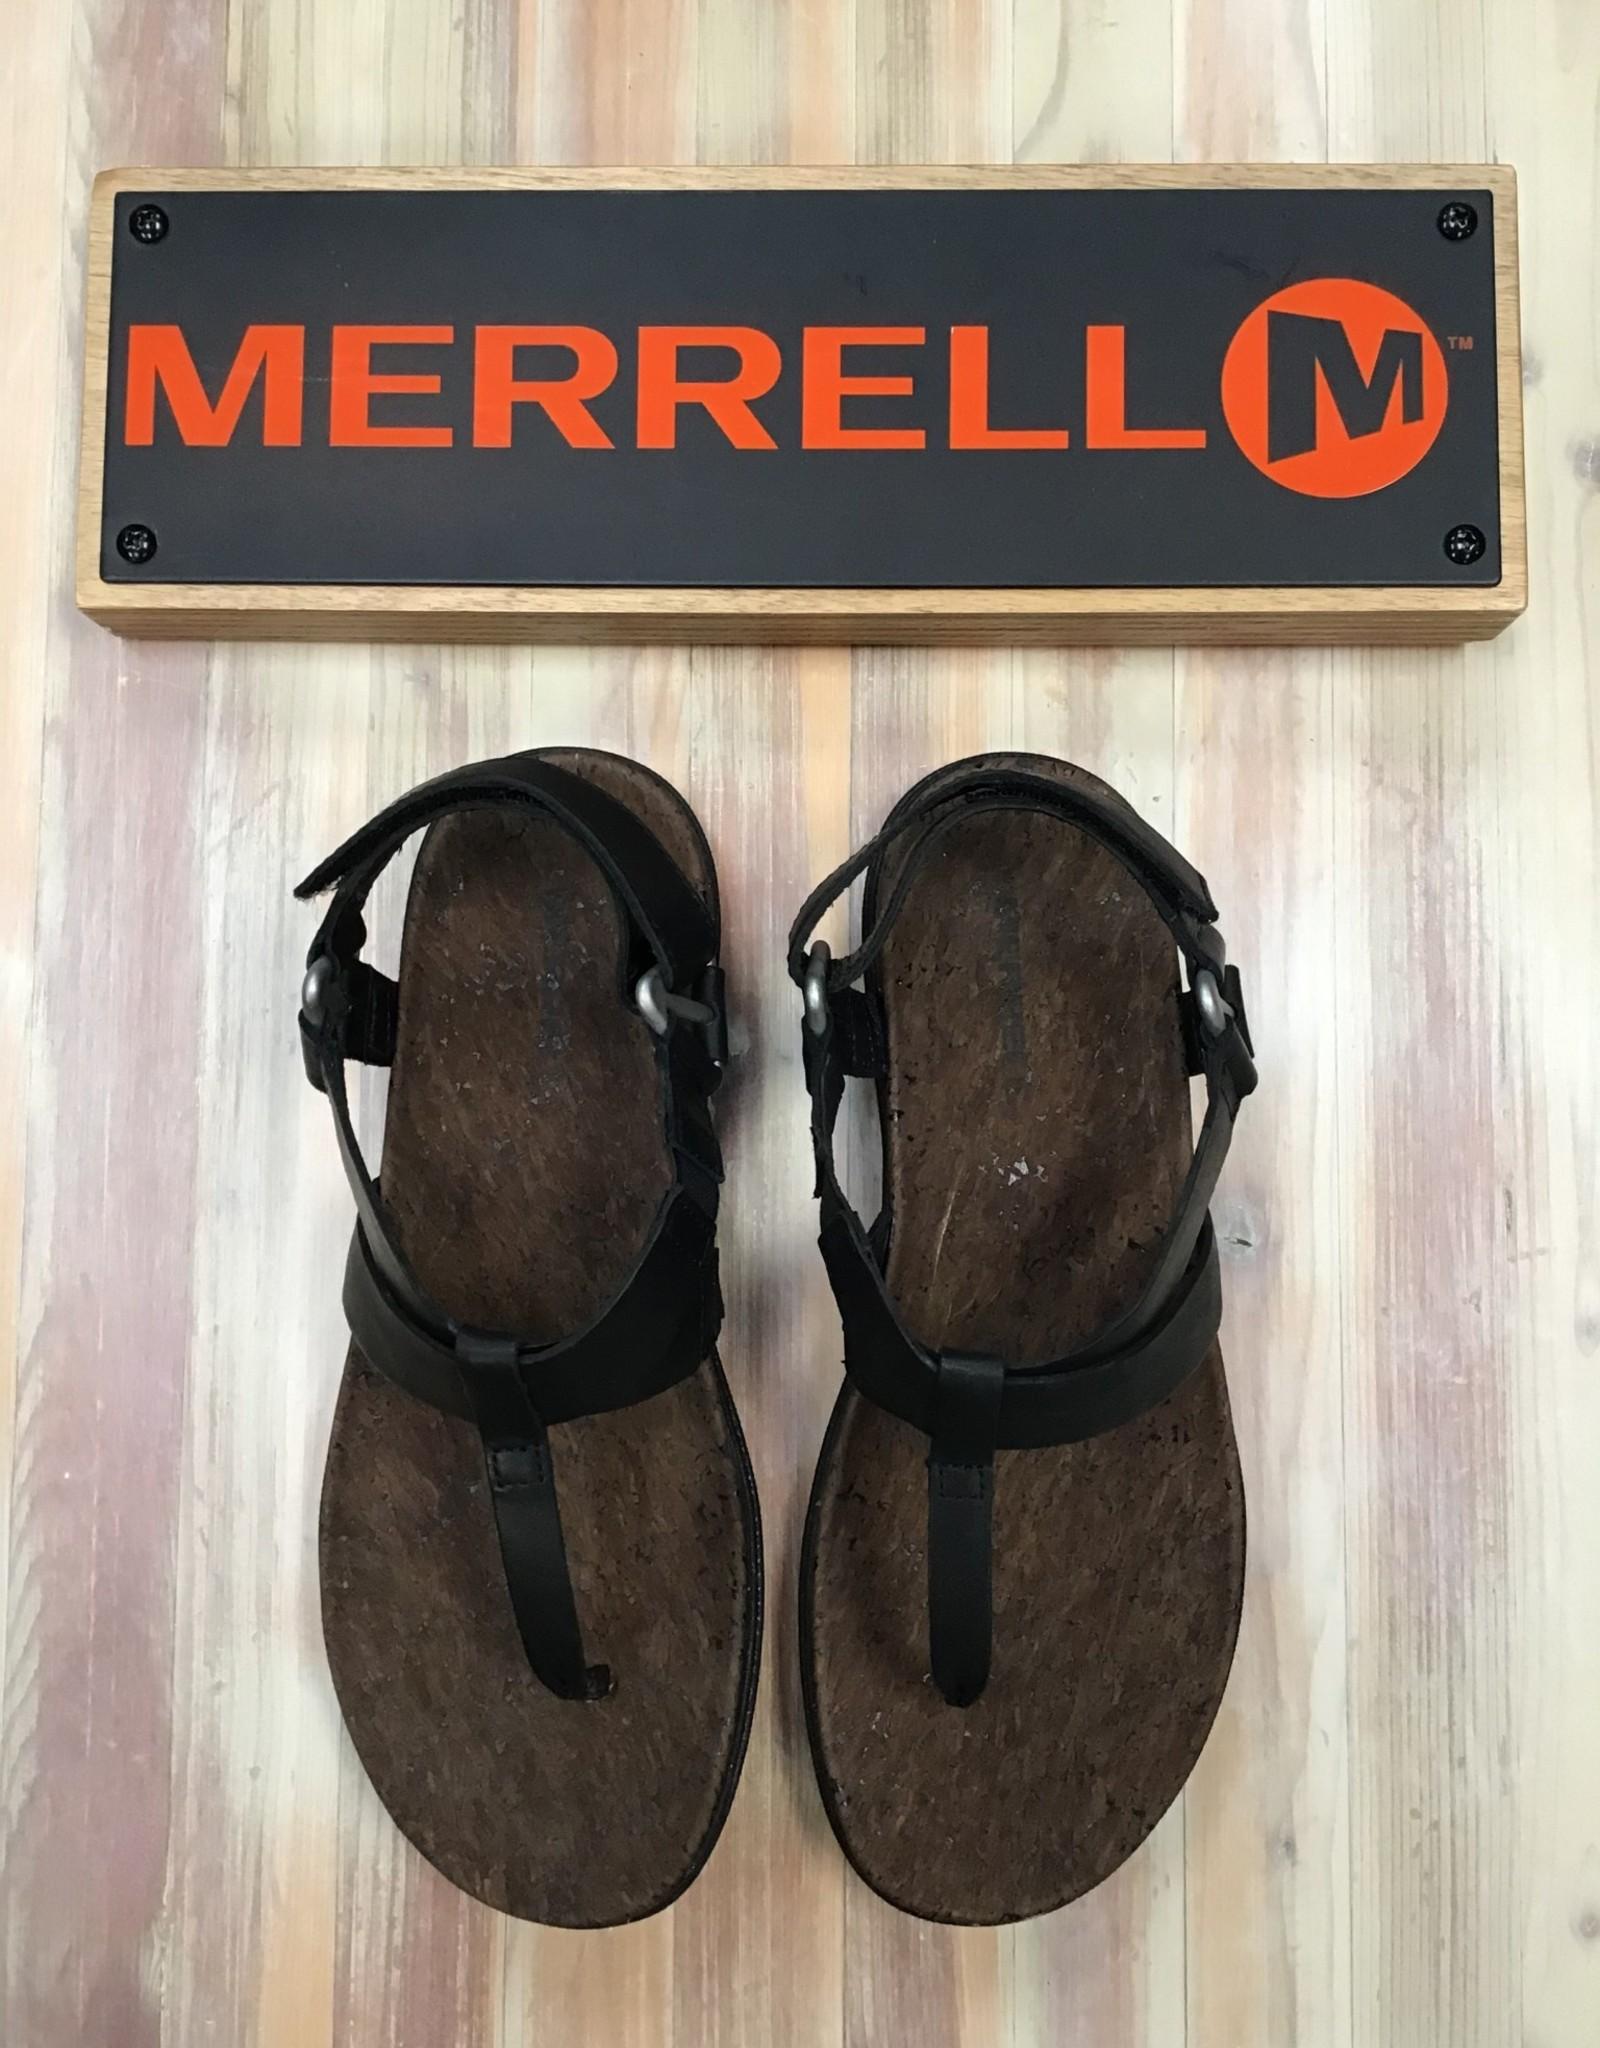 Merrell Merrell Around Town Chey T Strap Ladies'